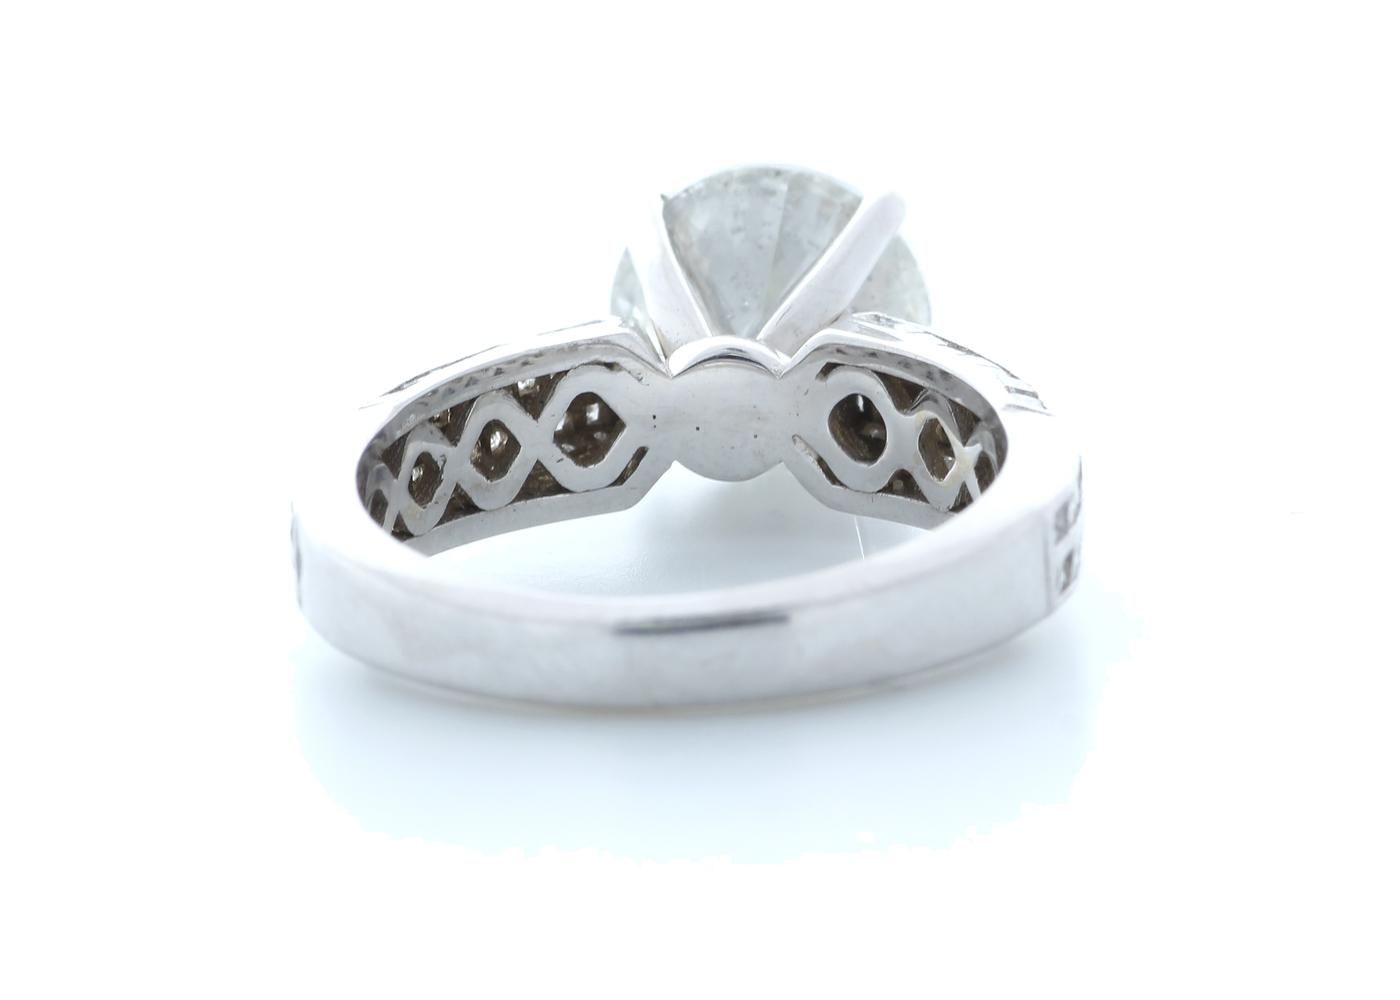 18ct White Gold Diamond Ring 4.51 (3.57) Carats - Image 3 of 5